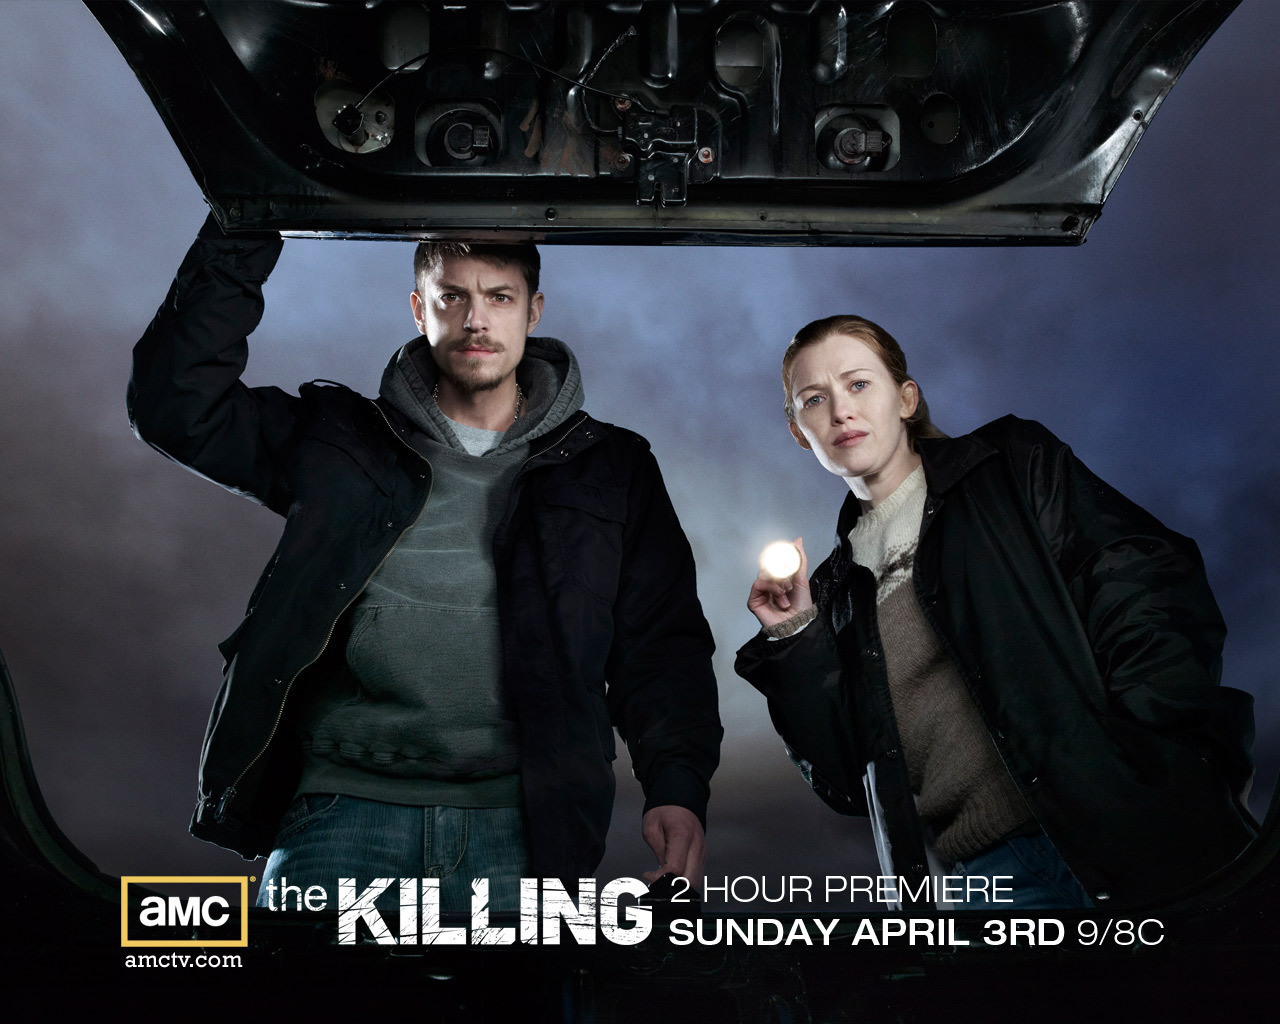 The Killing The-Killing-the-killing-19837858-1280-1024